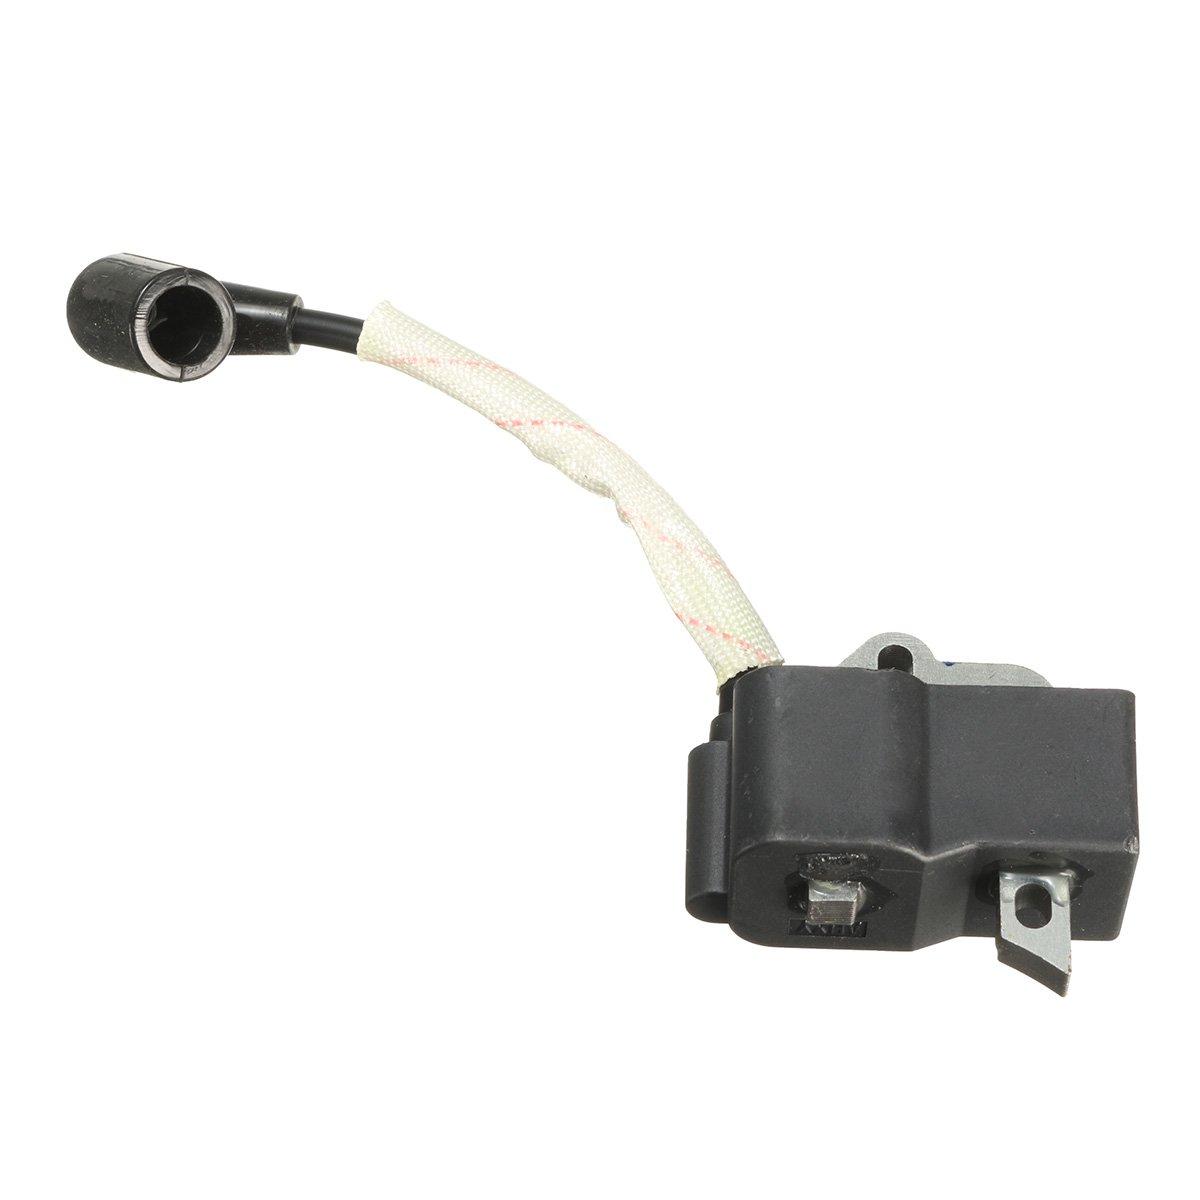 ignition coil for husqvarna 124 125 128 trimmer 530039224